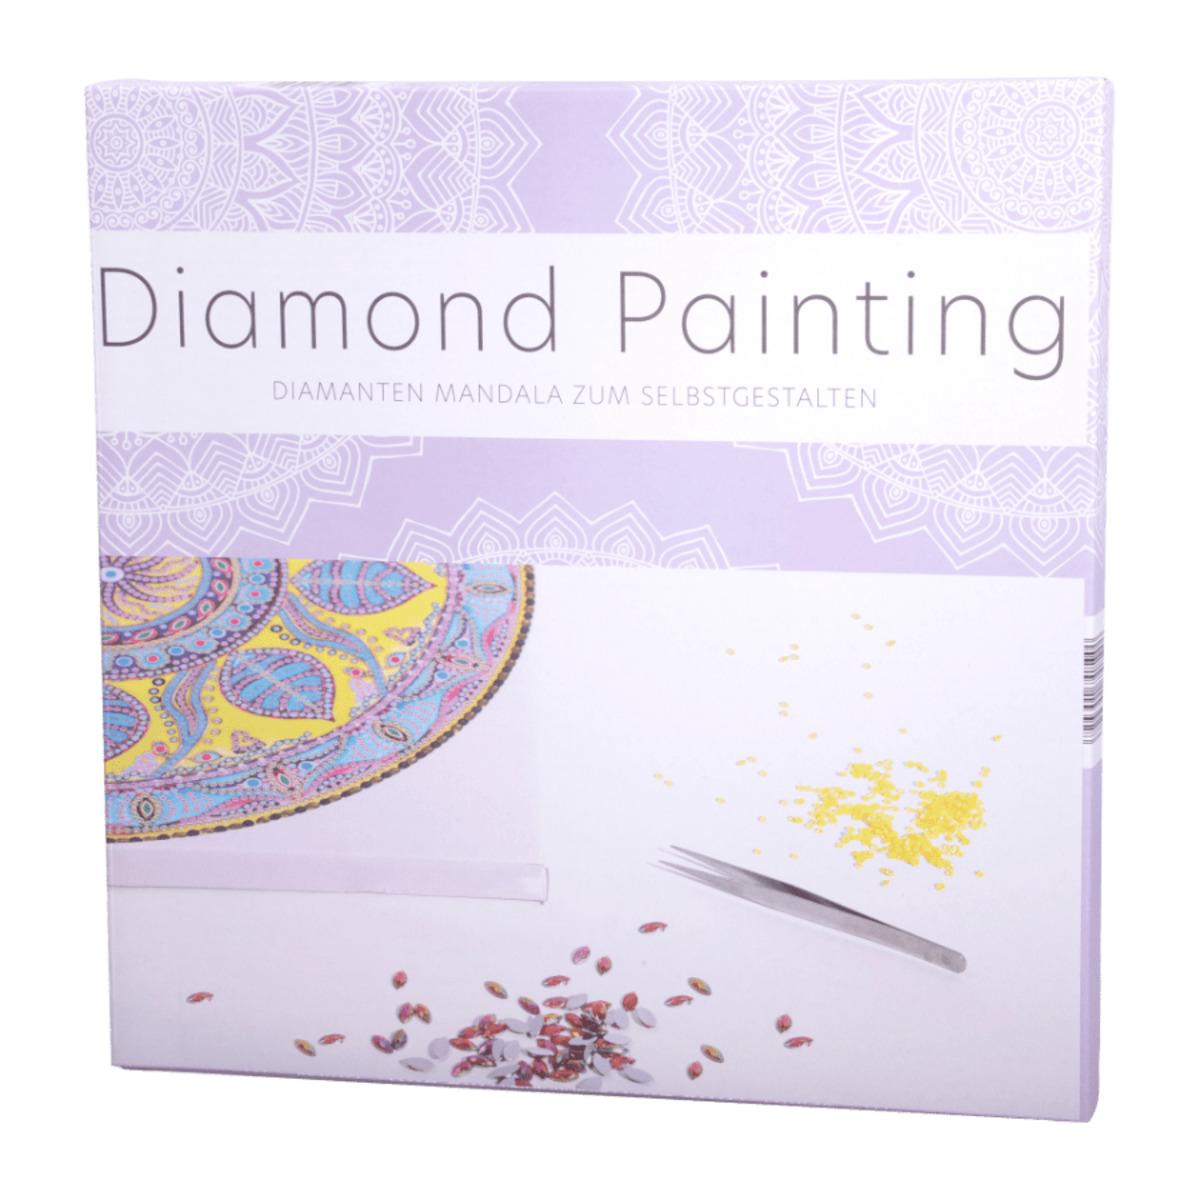 Bild 3 von Diamond Painting